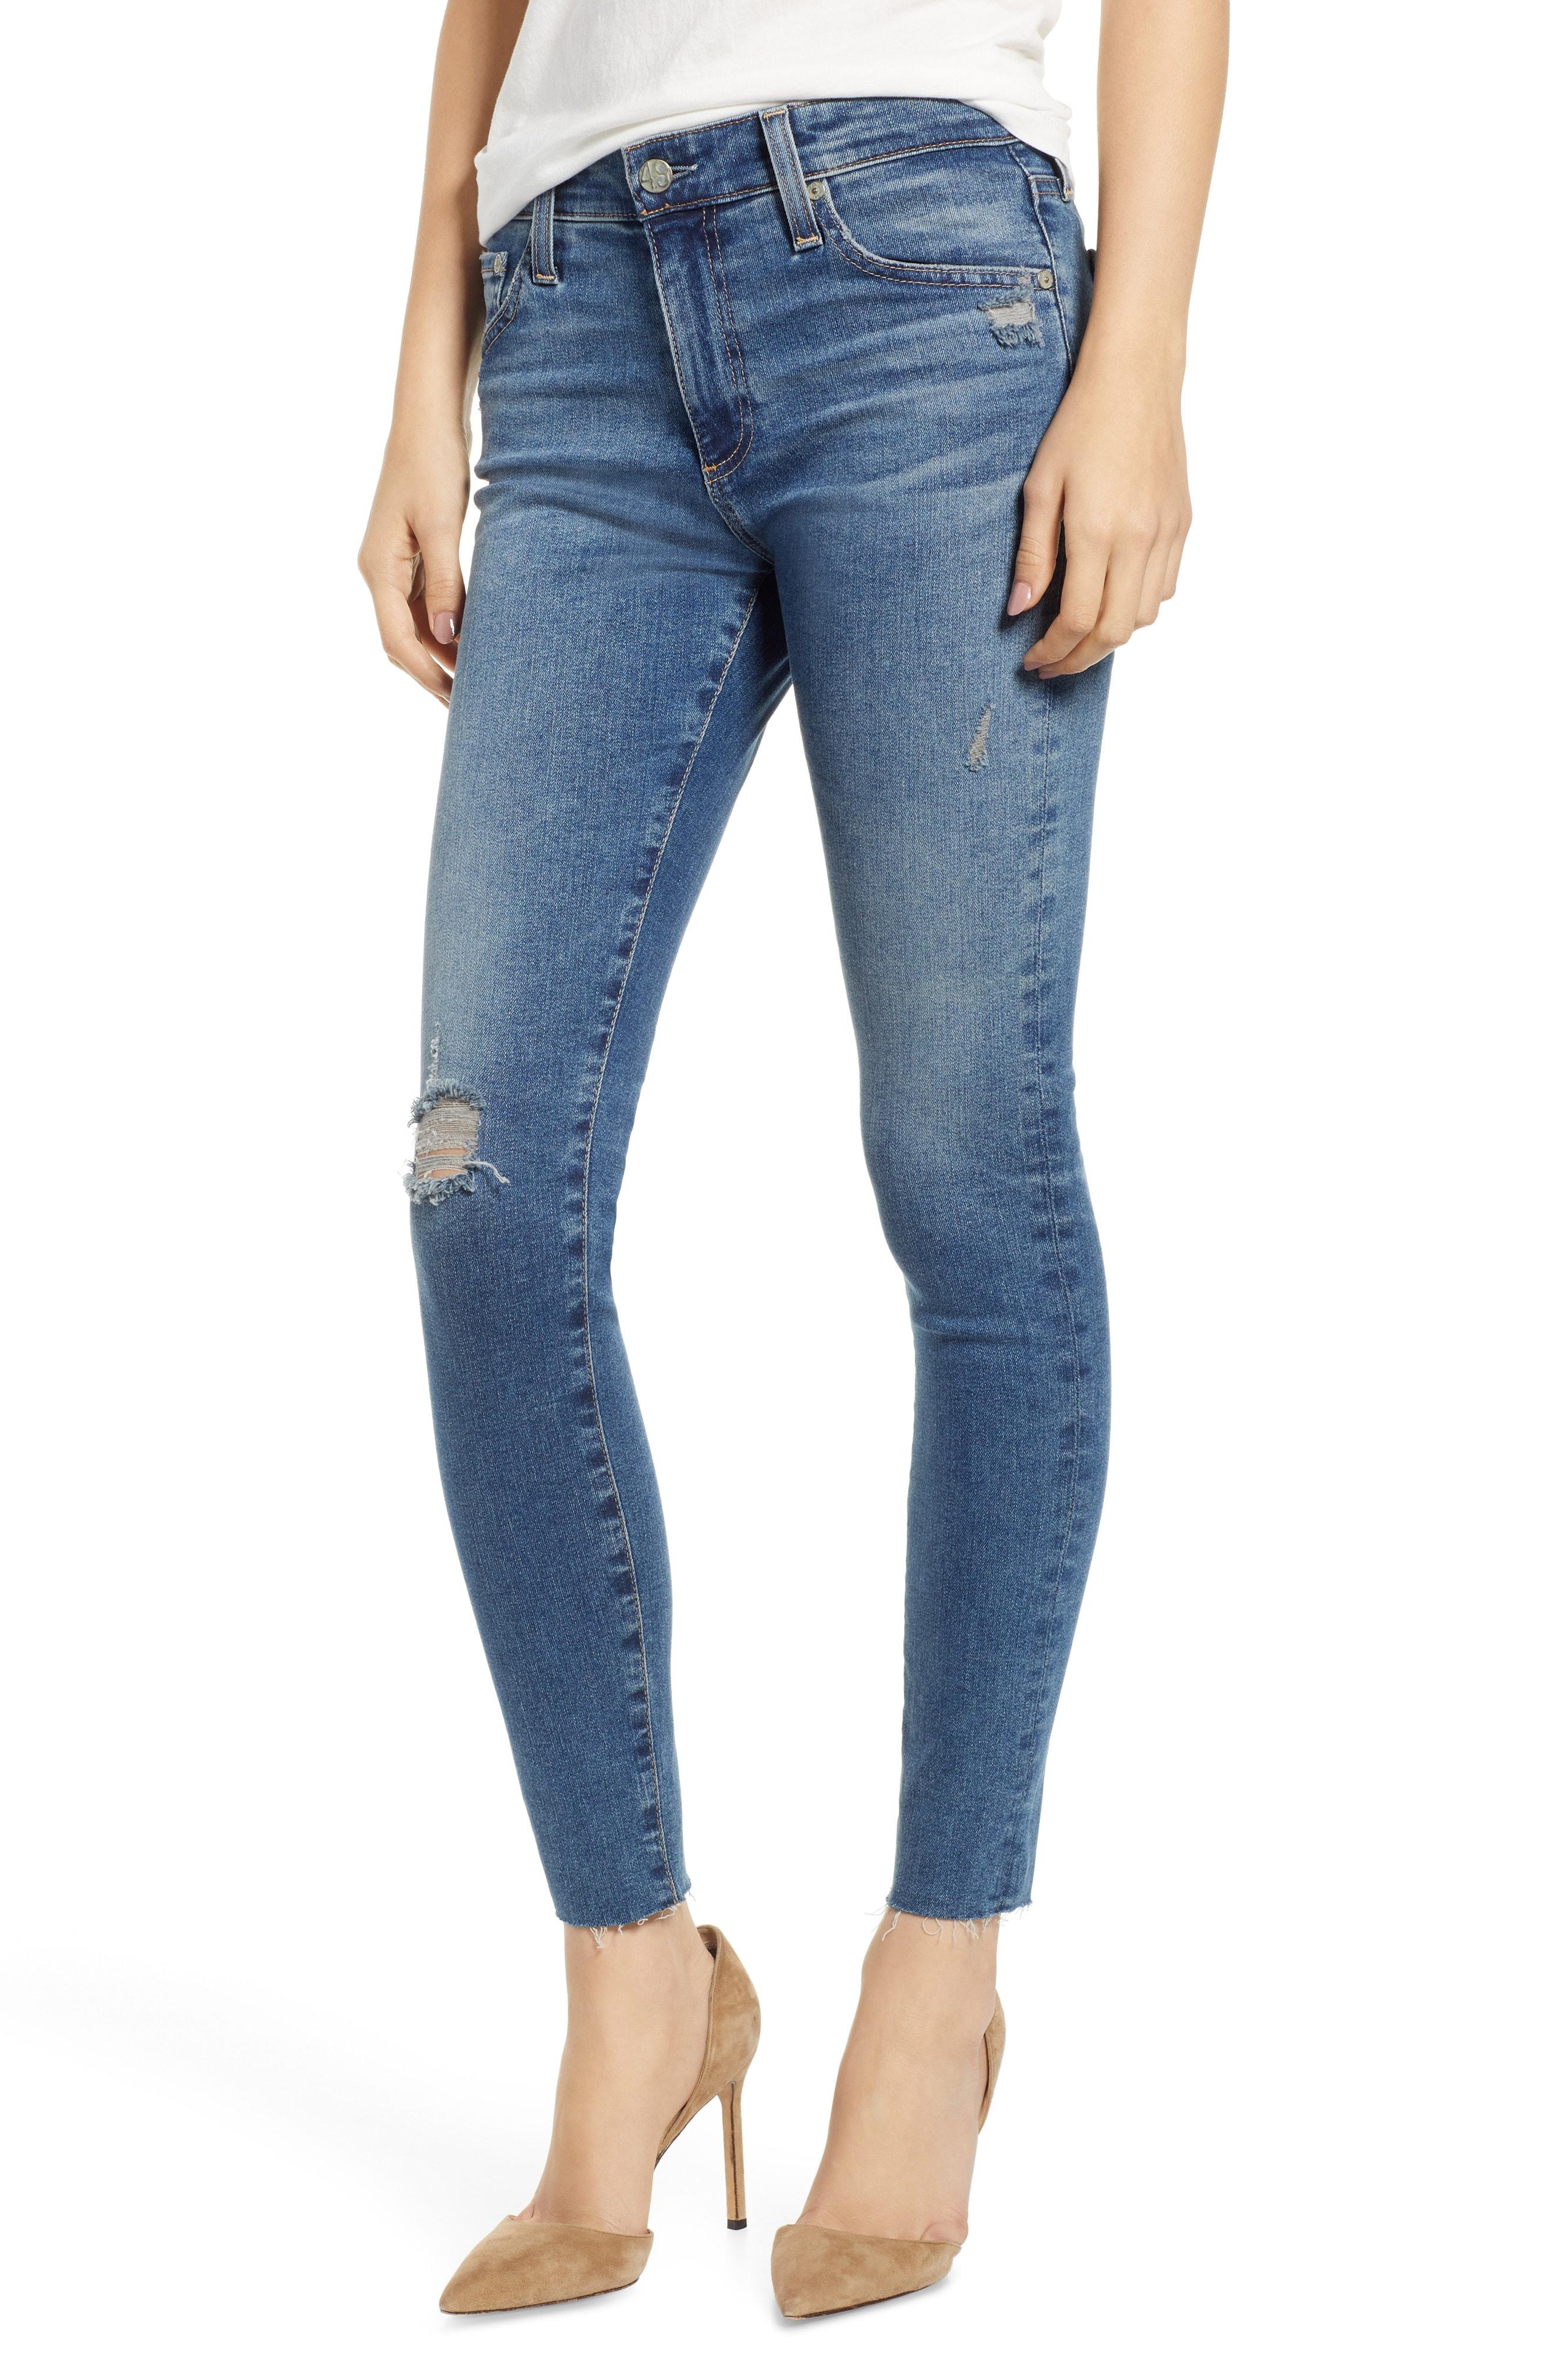 AG The Farrah High Waist Ankle Skinny Jeans (18 Years Cruising)